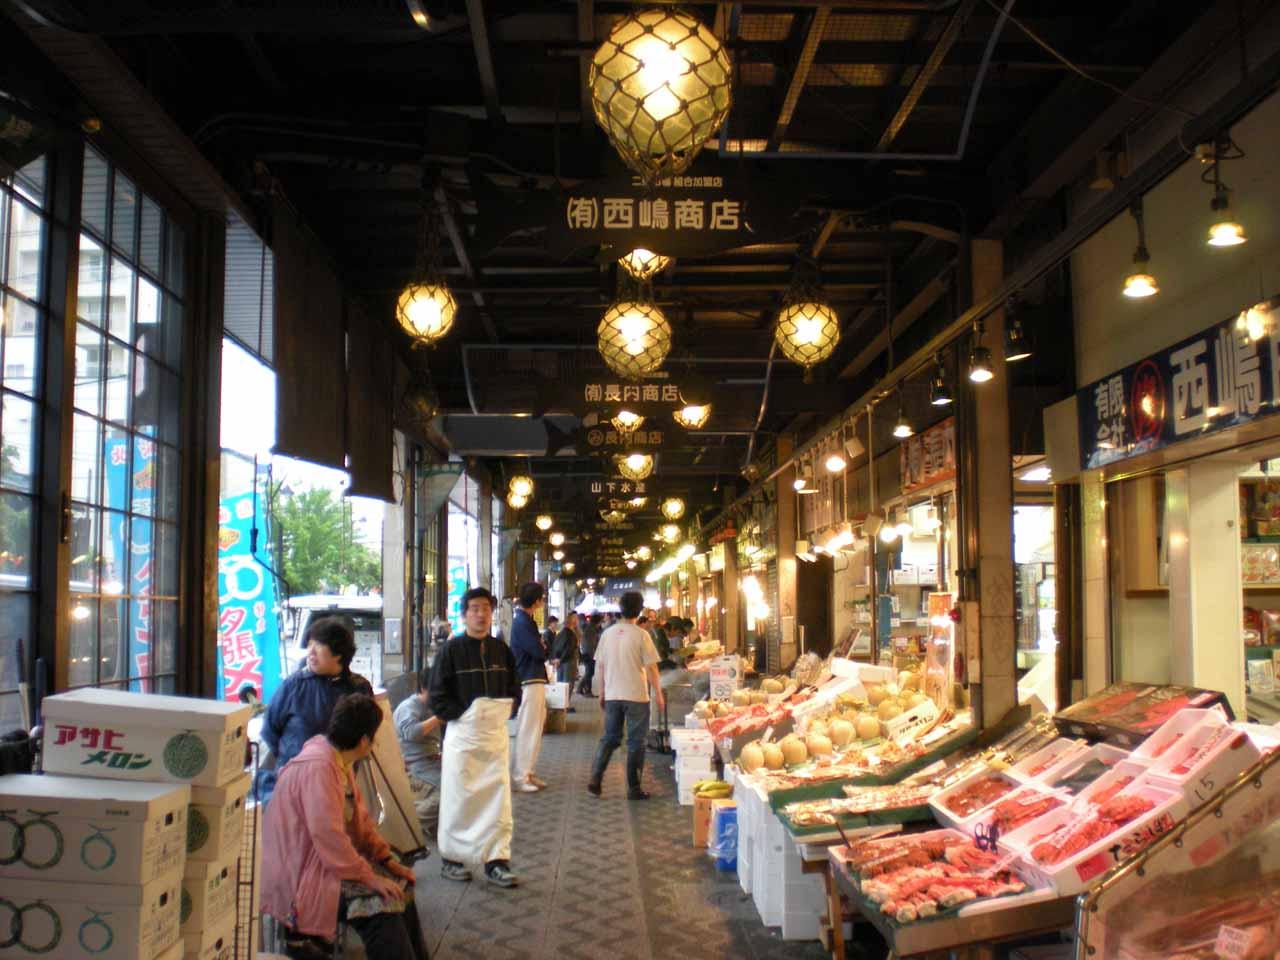 The Nijo Fish Market